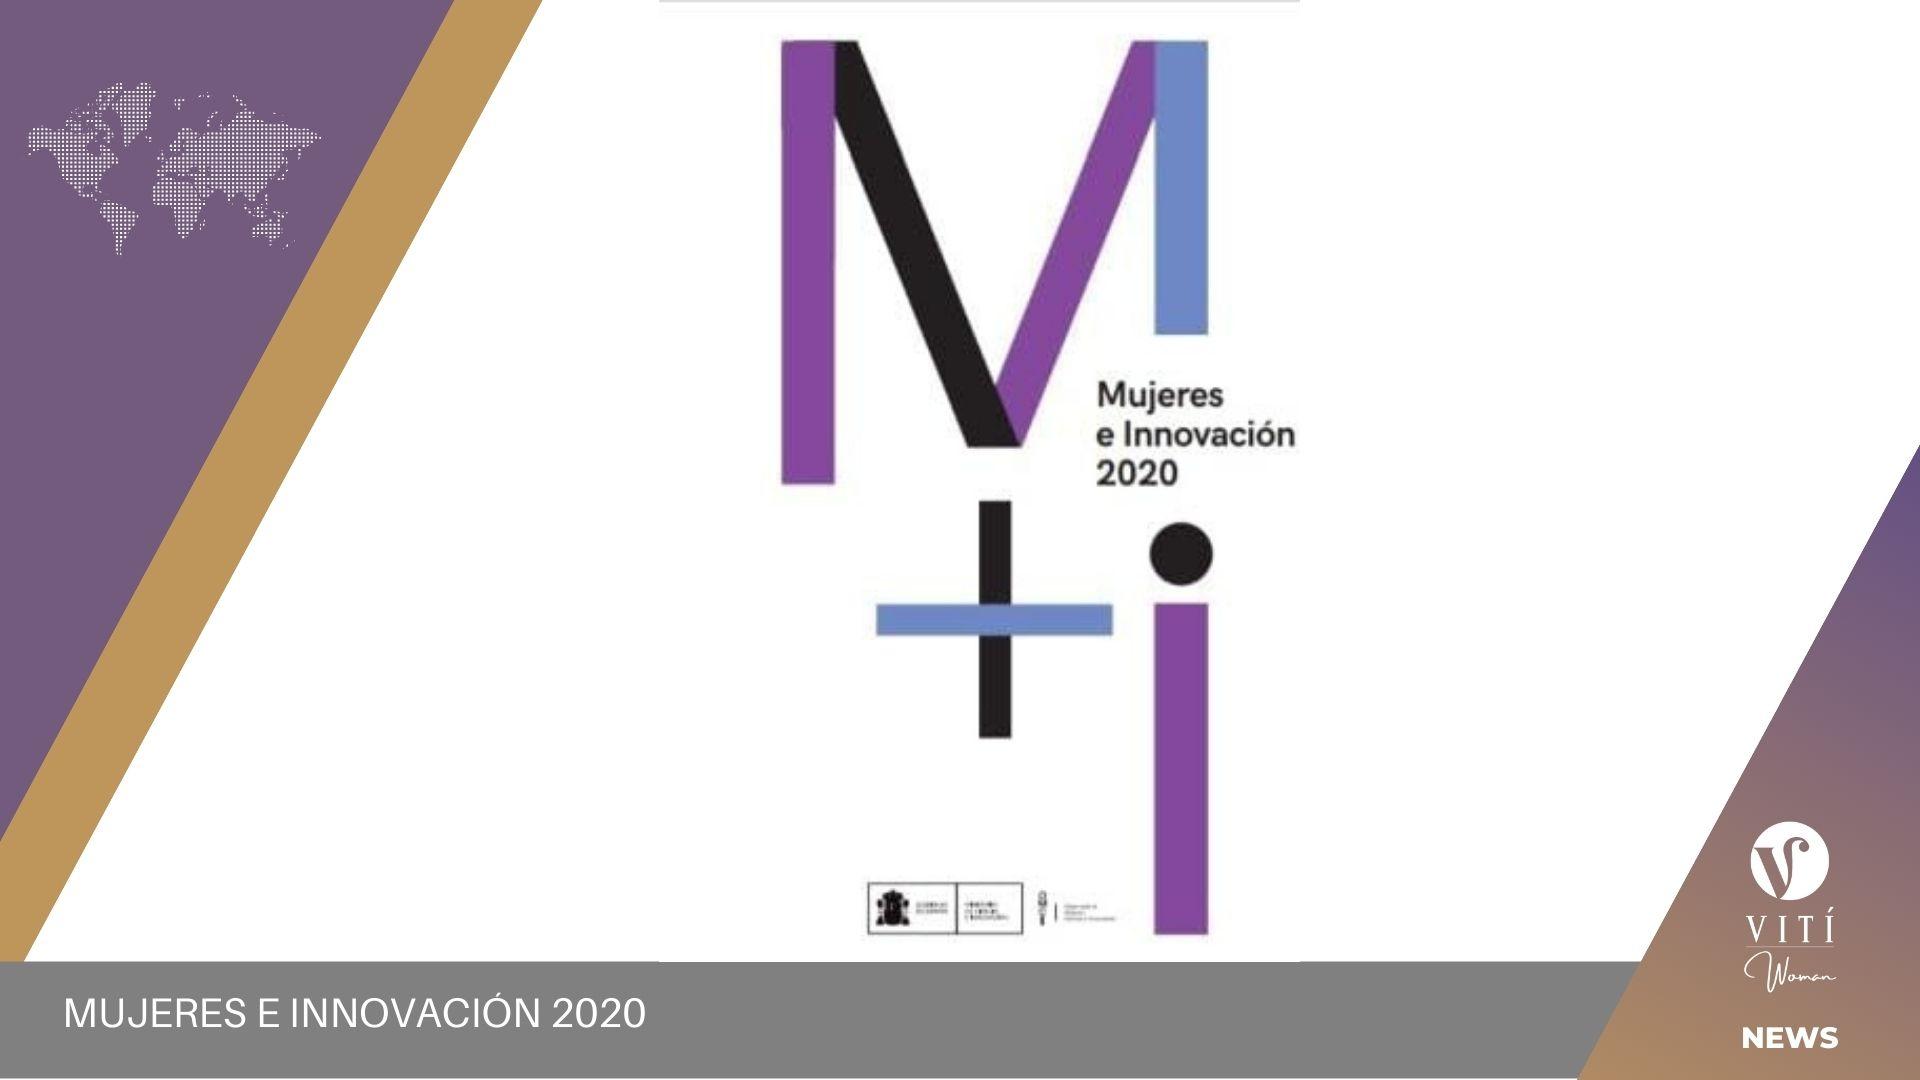 blog-vitiwoman-Mujeres-e-innovacion-2020